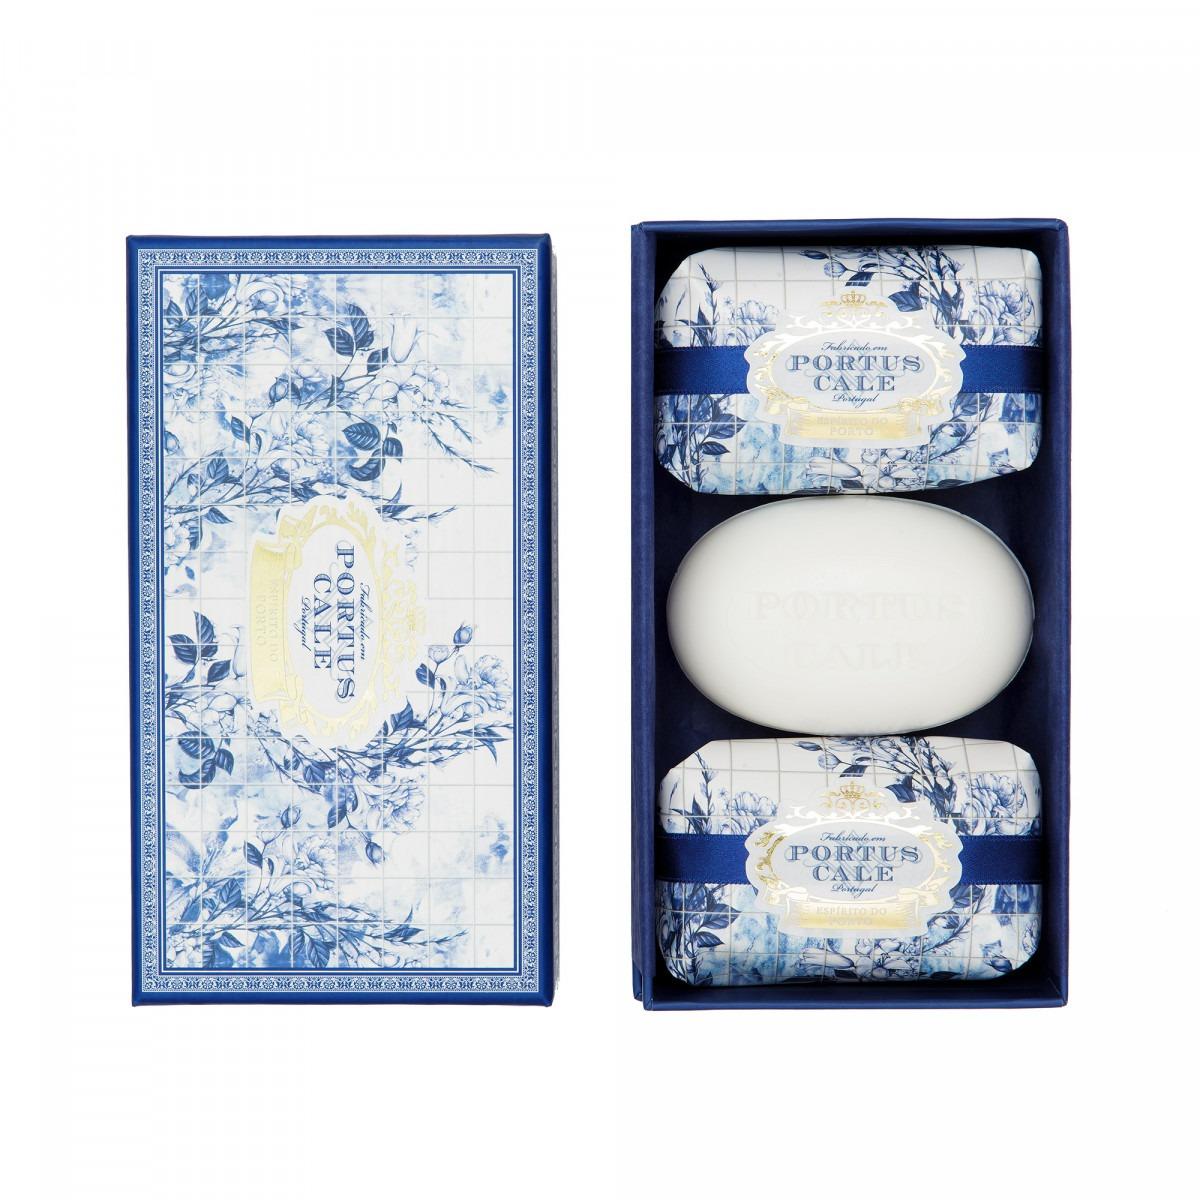 Portus Cale Gold and Blue Soap Set 3 x 150g